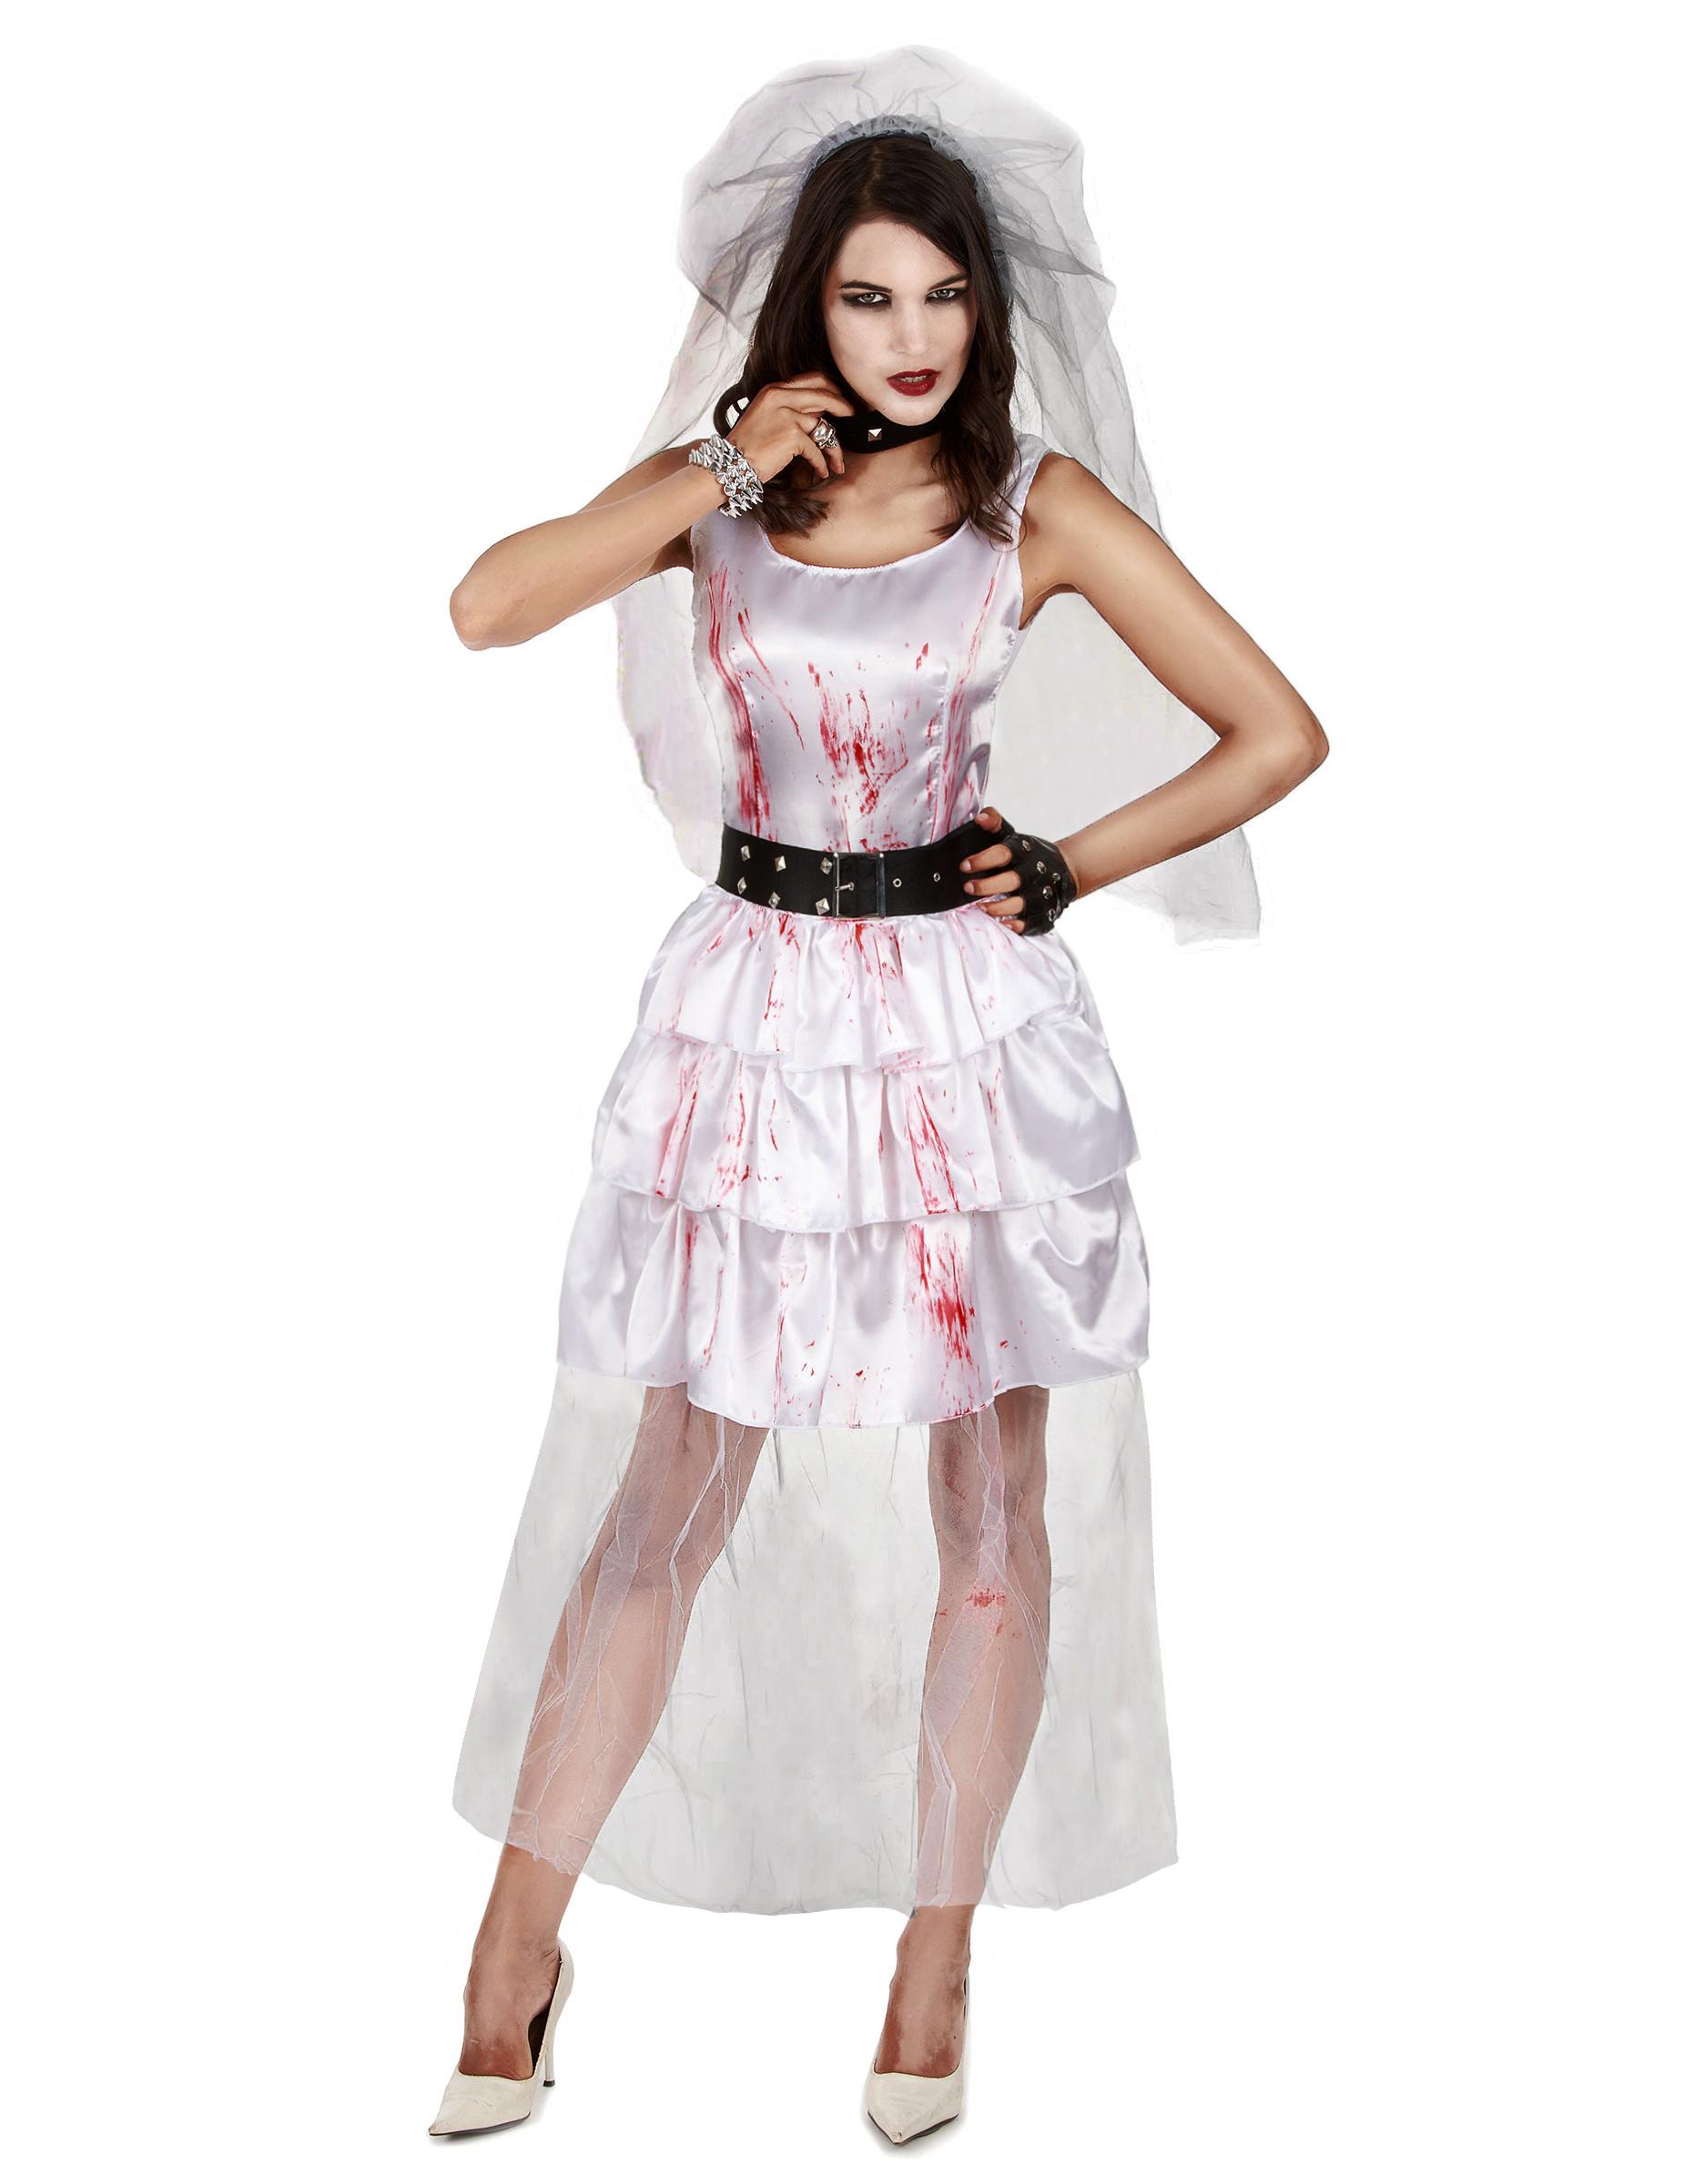 p zombie braut kostum damen halloween type=product